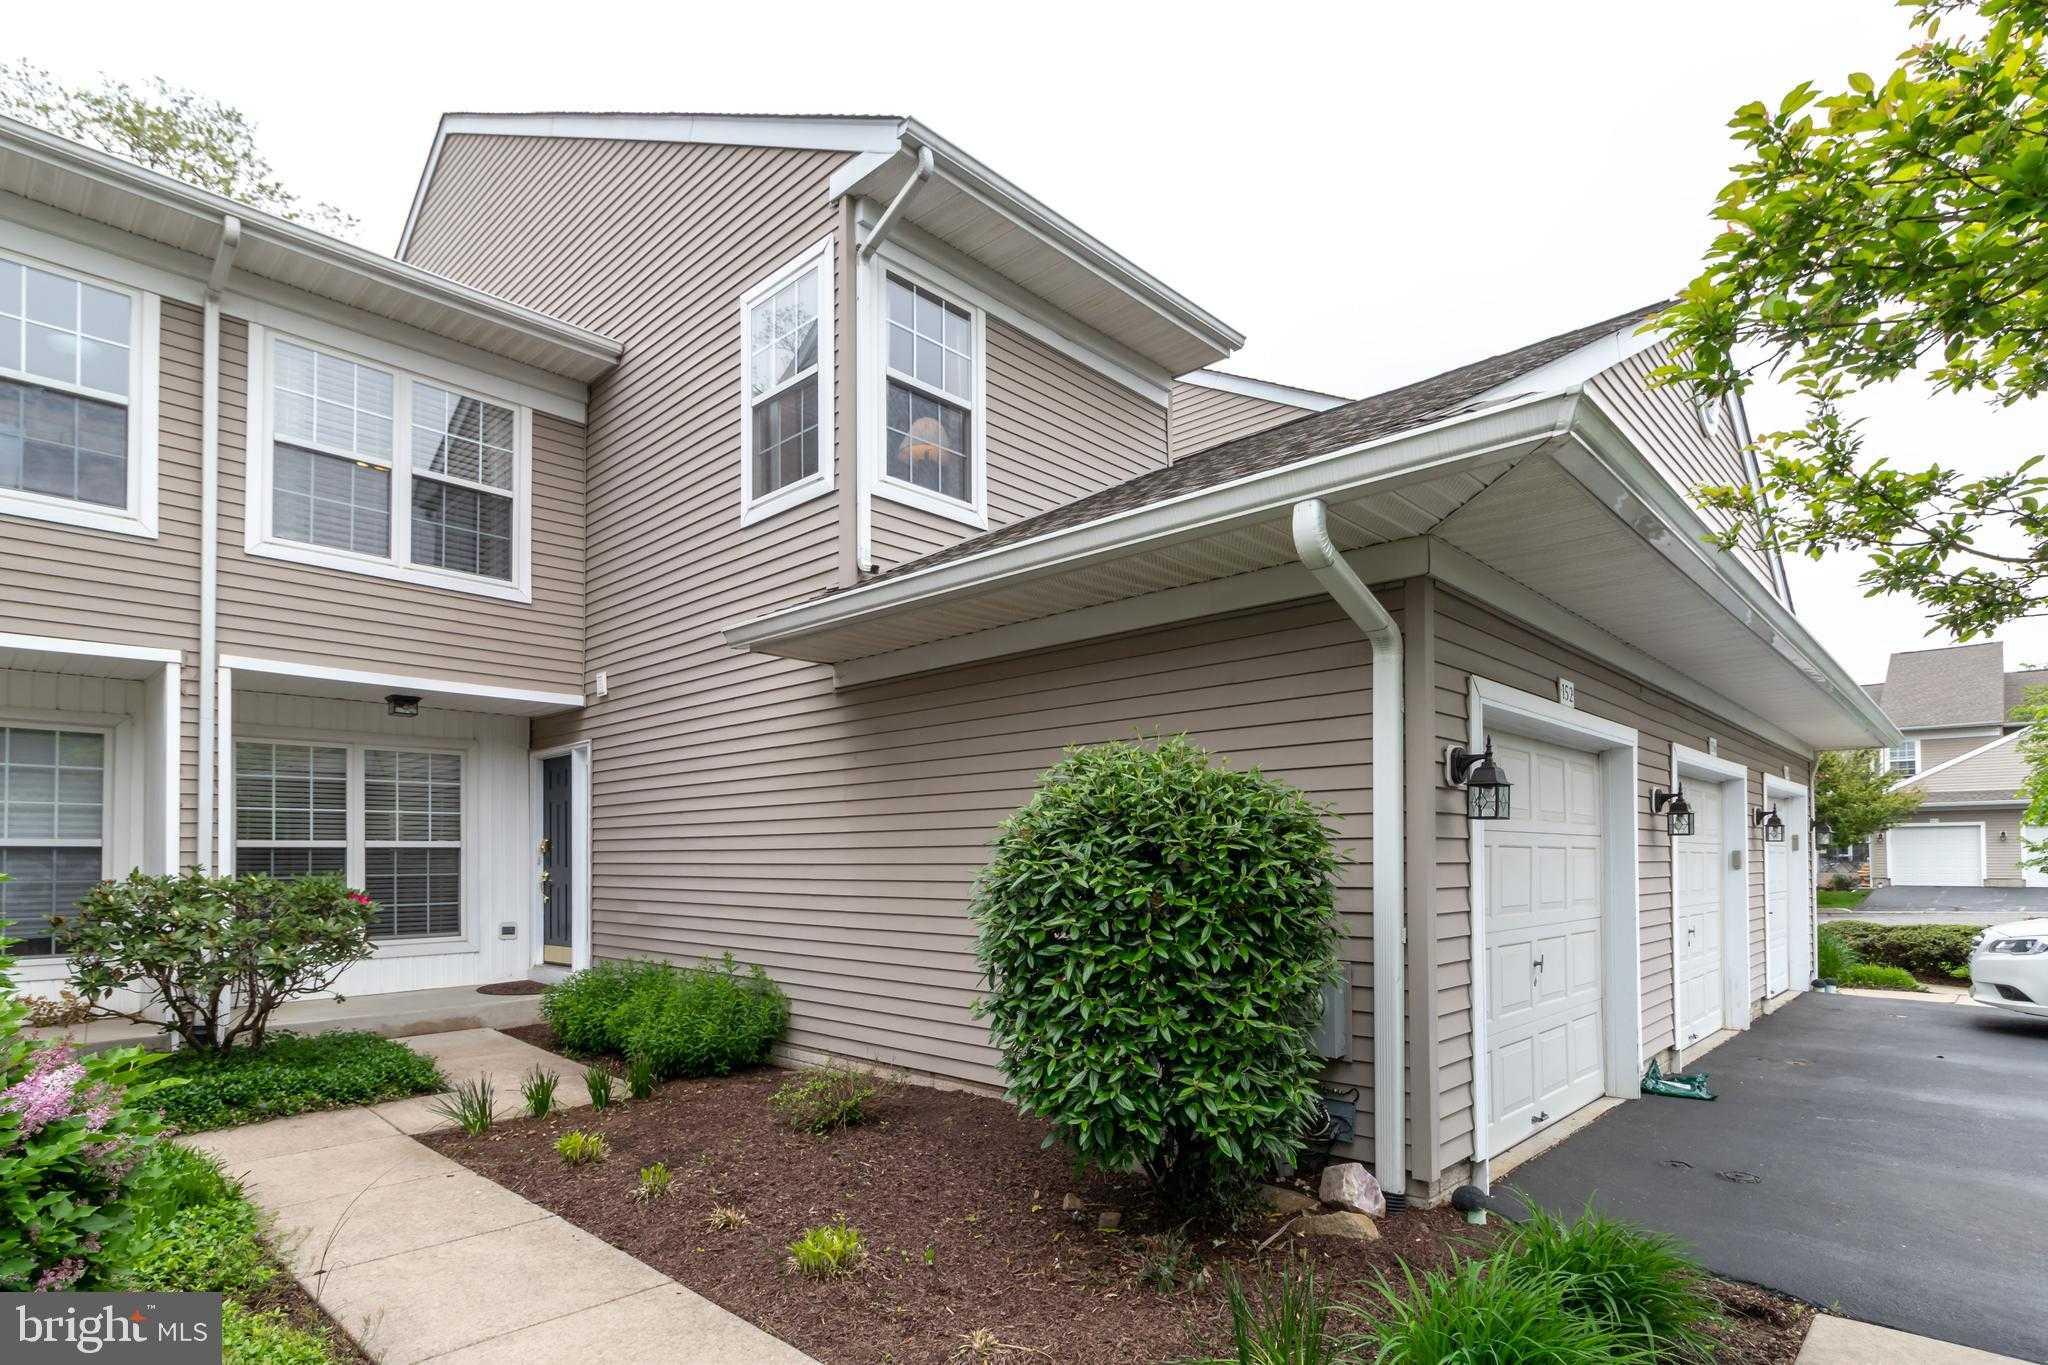 homes for sale in charlestown hunt michael richter rh homefinderpa com